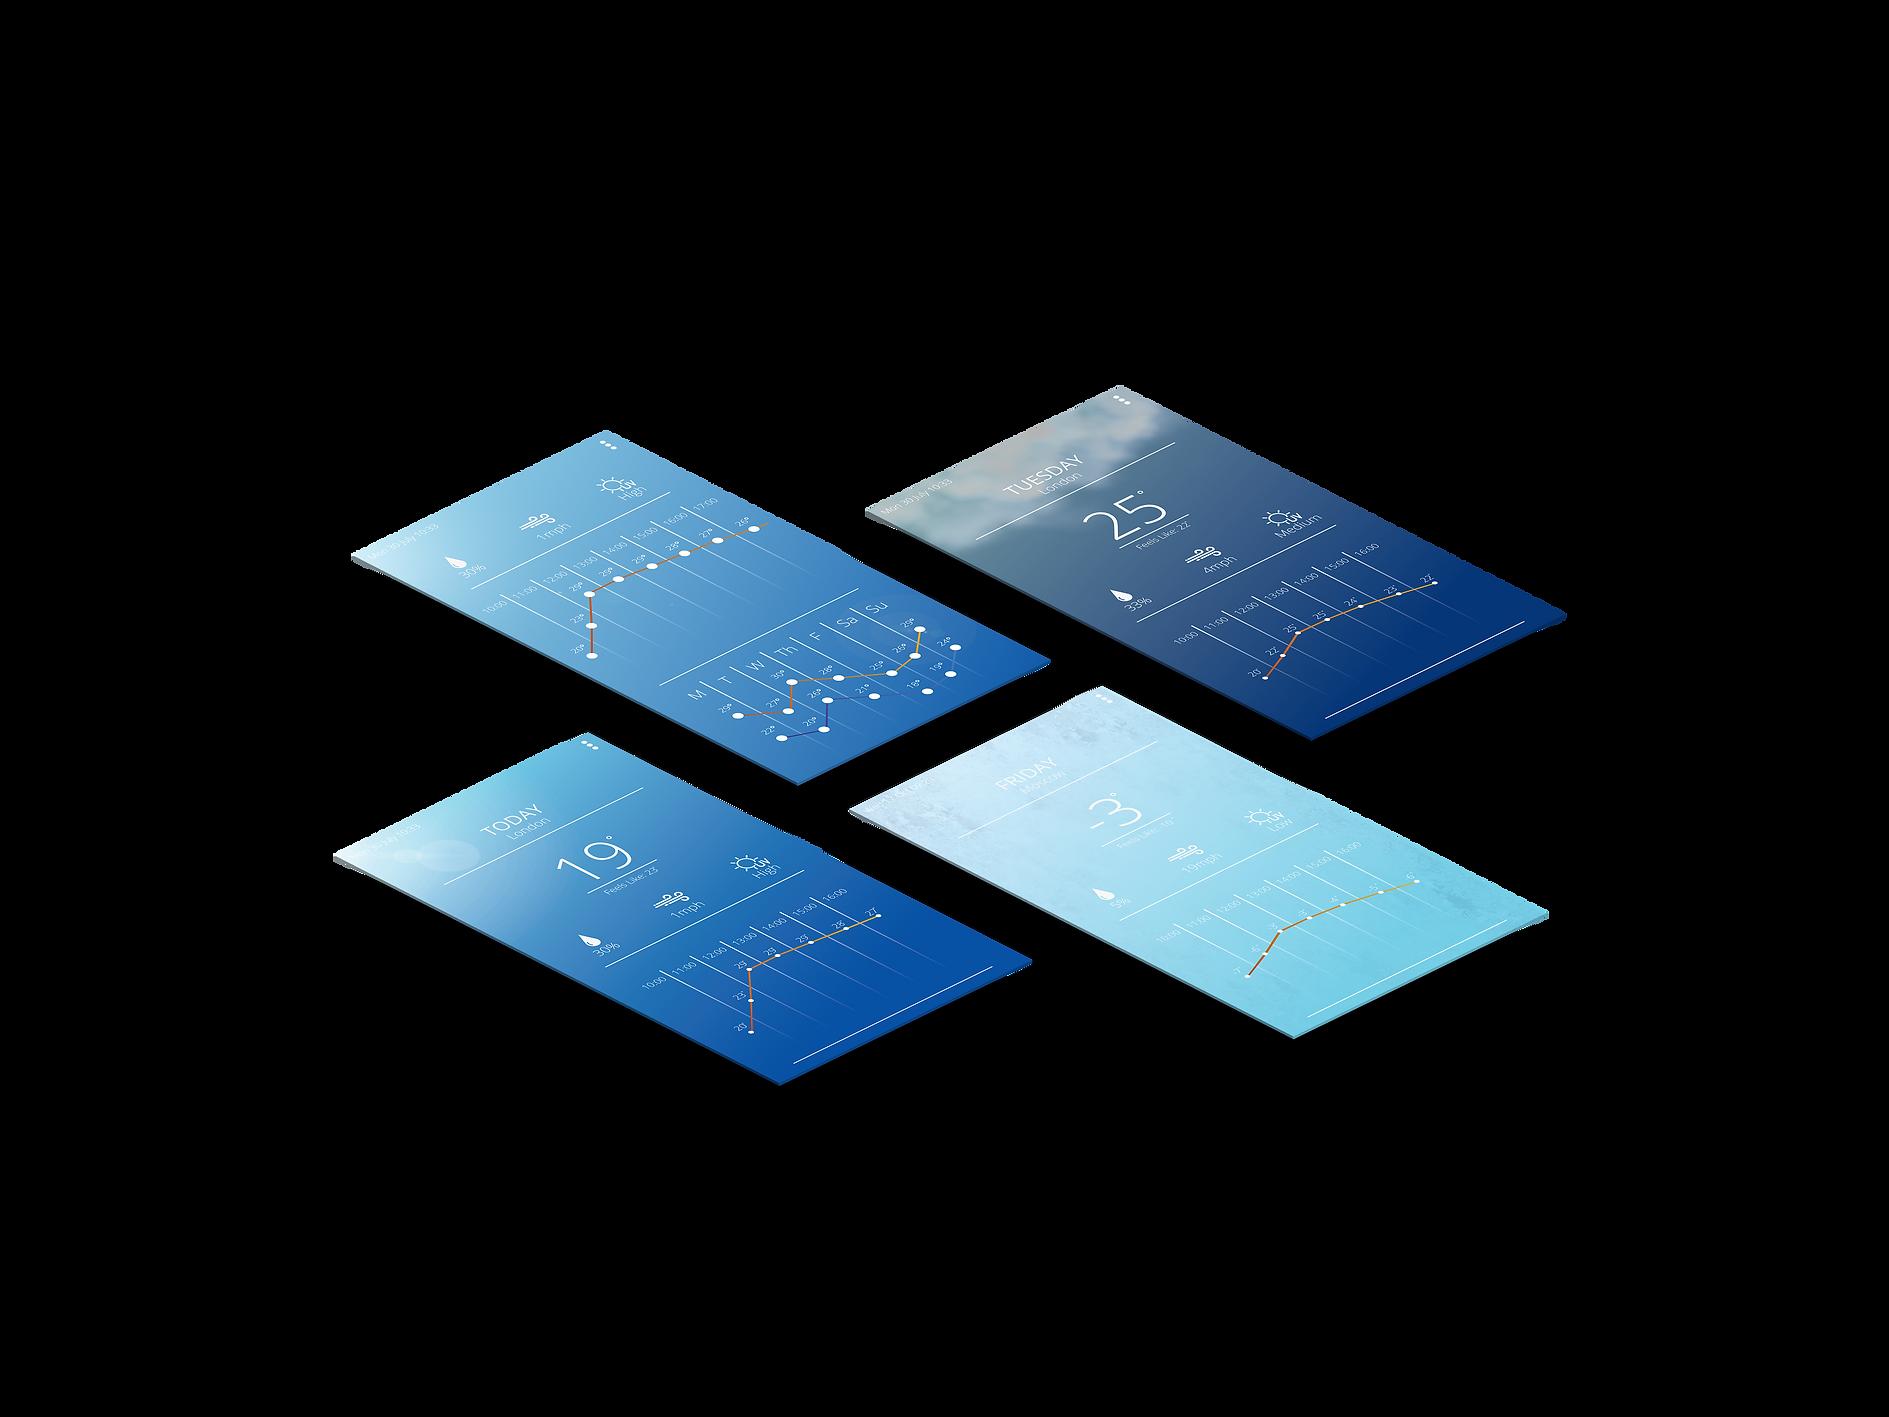 Perspective-App-Screens-Mock-Up.png